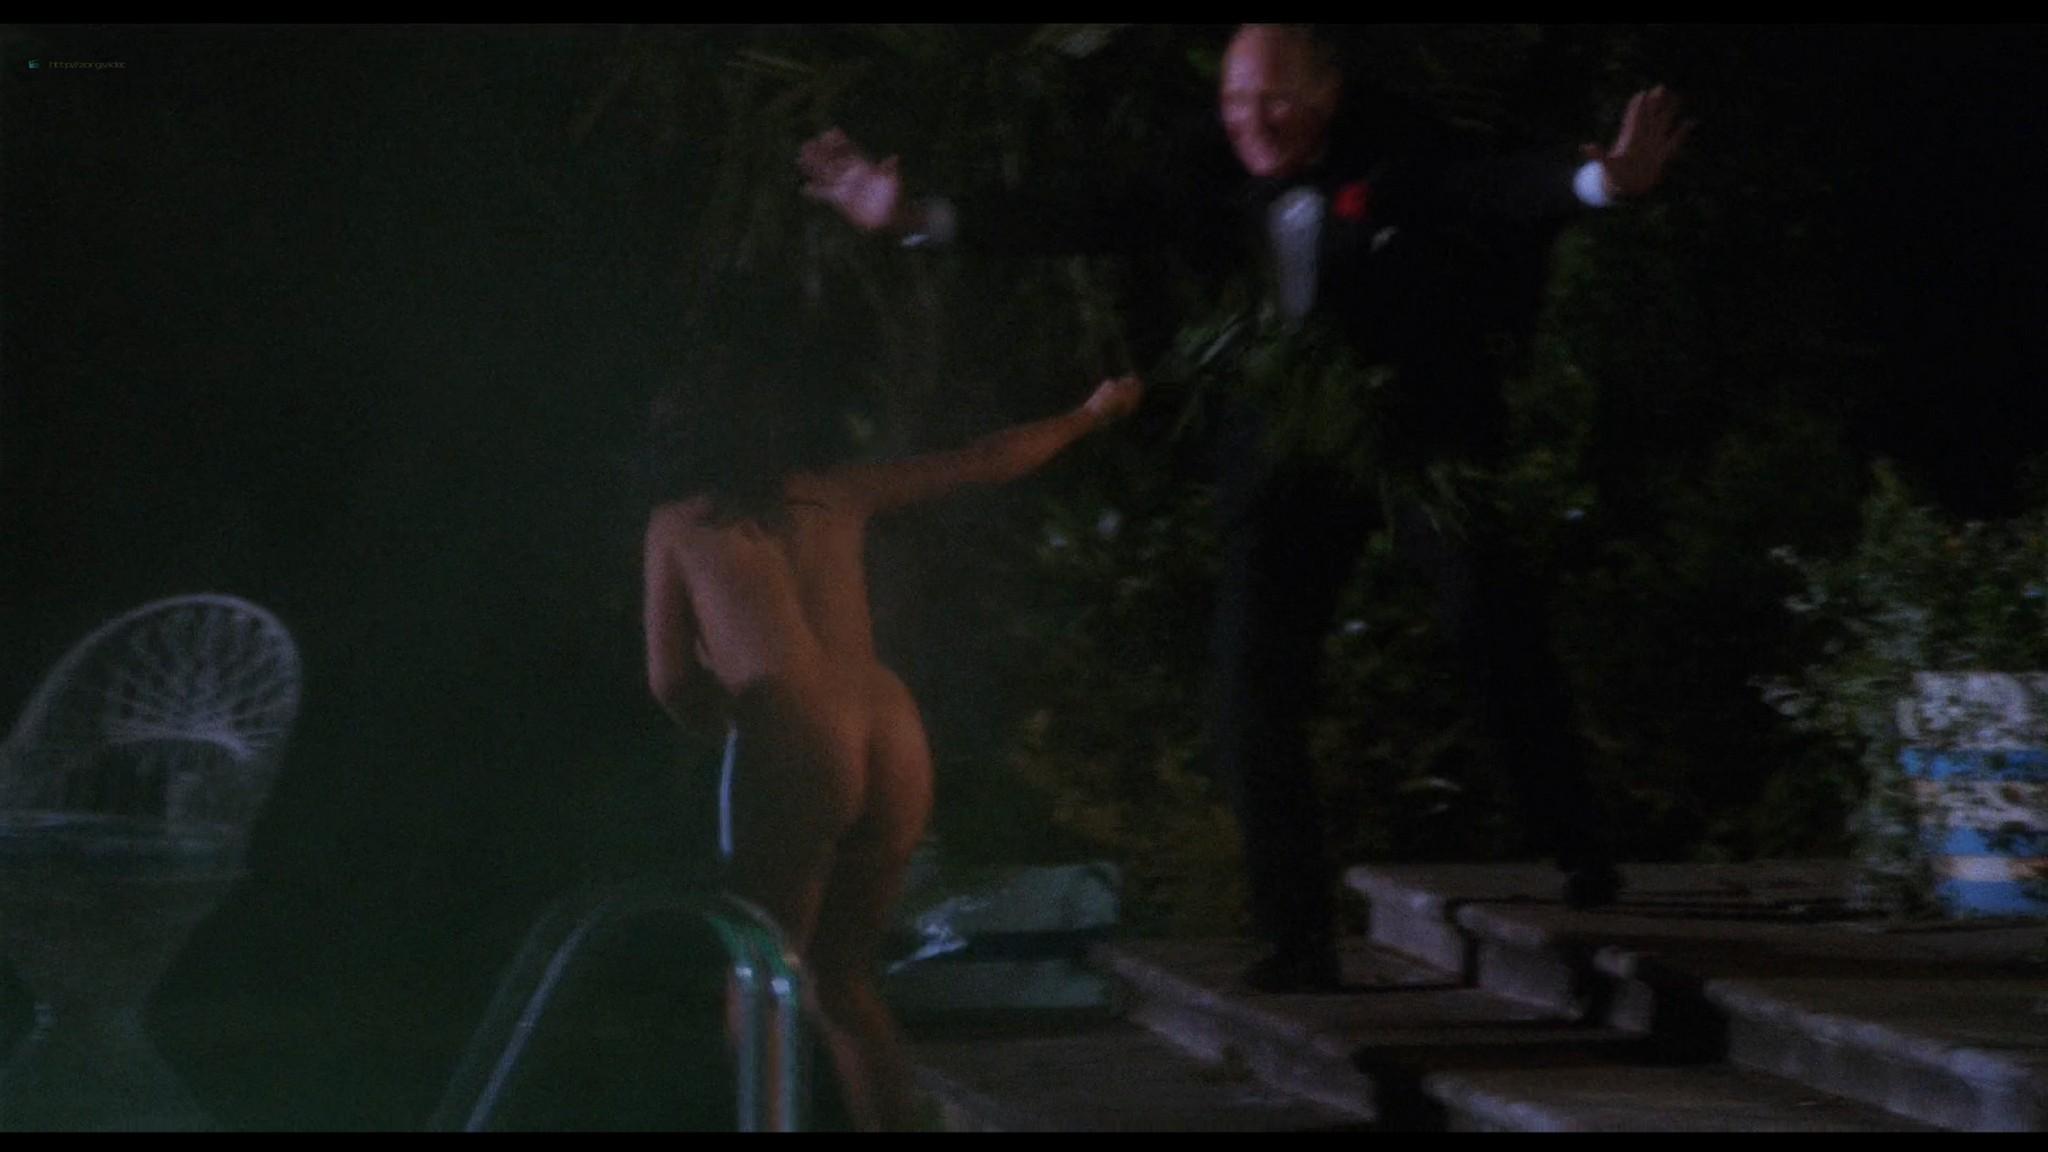 Bridget Fonda nude butt boobs Britt Ekland nude Joanne Whalley hot - Scandal (1989) HD 1080p BluRay (4)